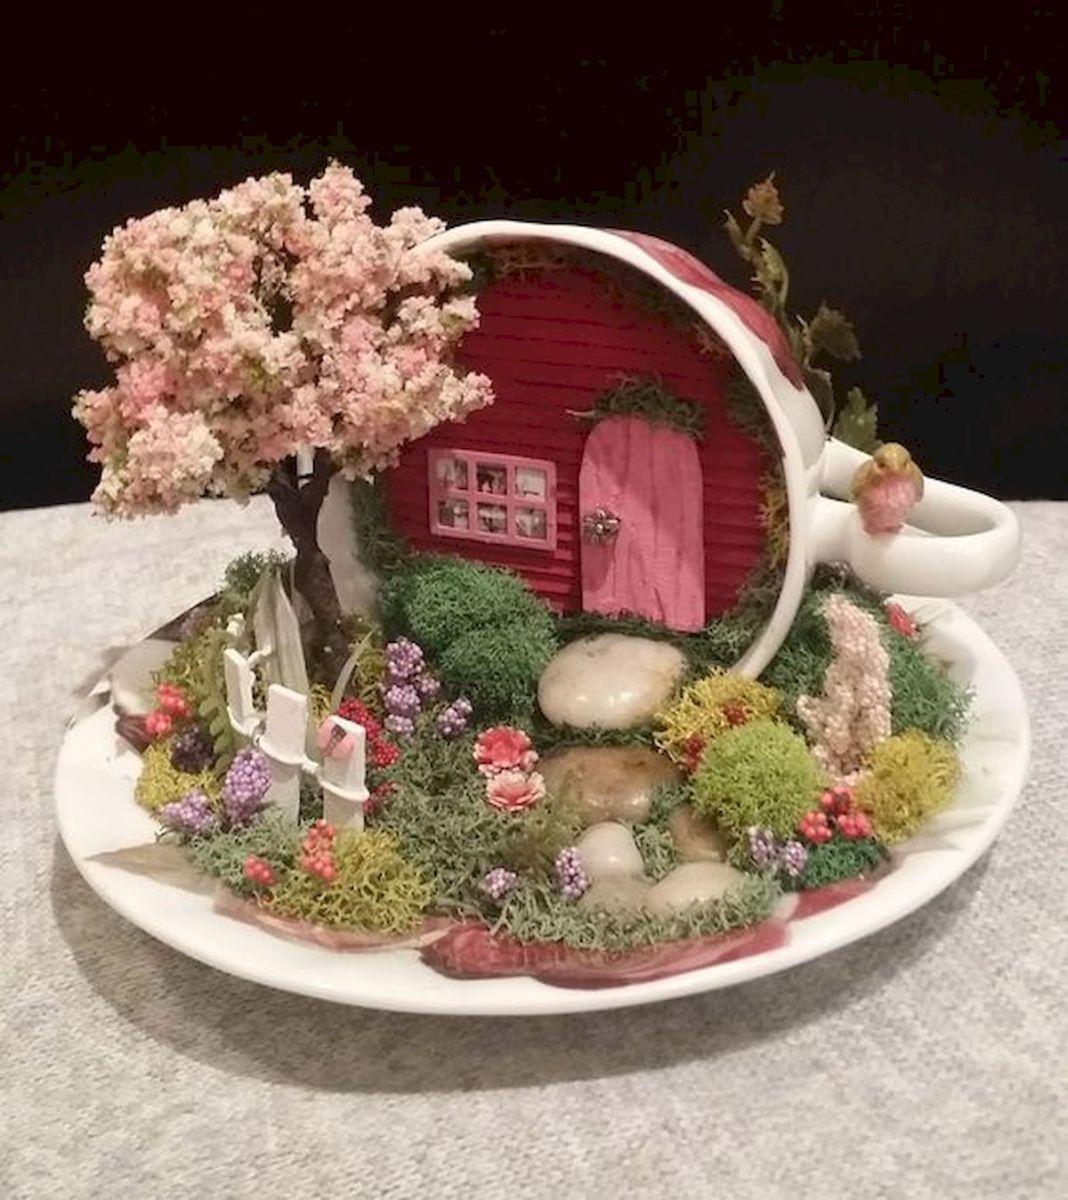 40 Easy DIY Teacup Mini Garden Ideas to Add Bliss to Your Home (2 #diybeauty